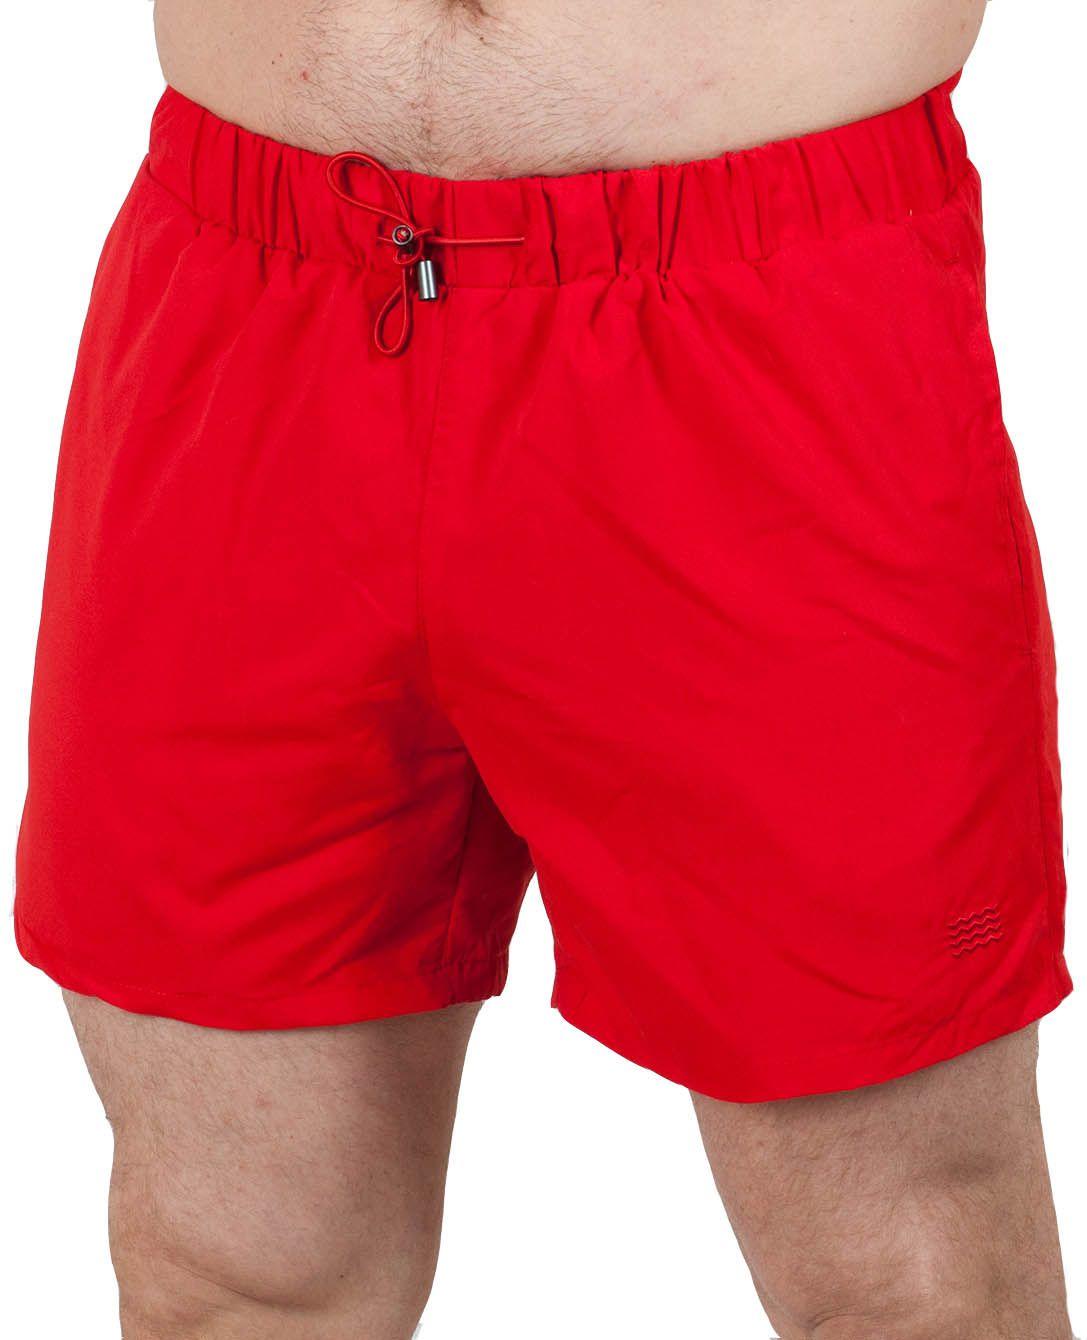 Яркие мужские шорты для плавания (Topman) - вид спереди